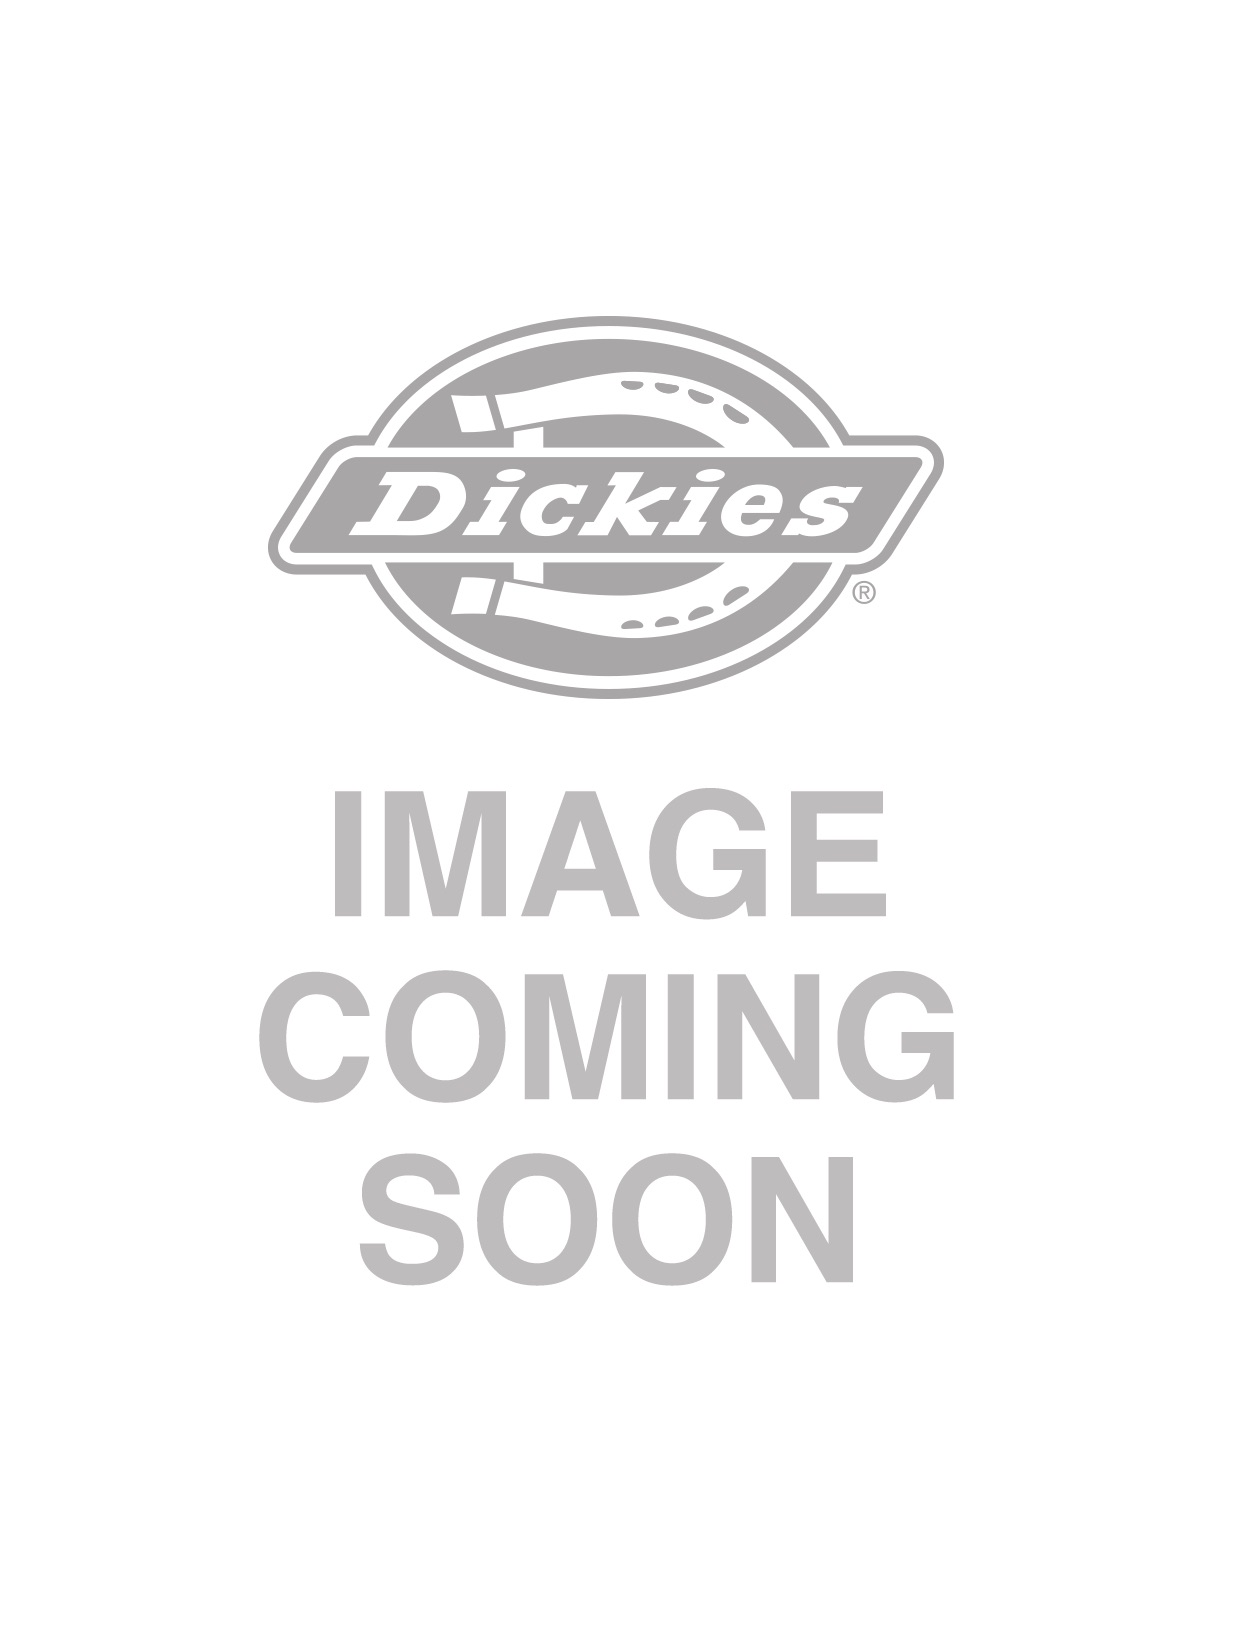 Dickies Cloverport Cord Work Pant